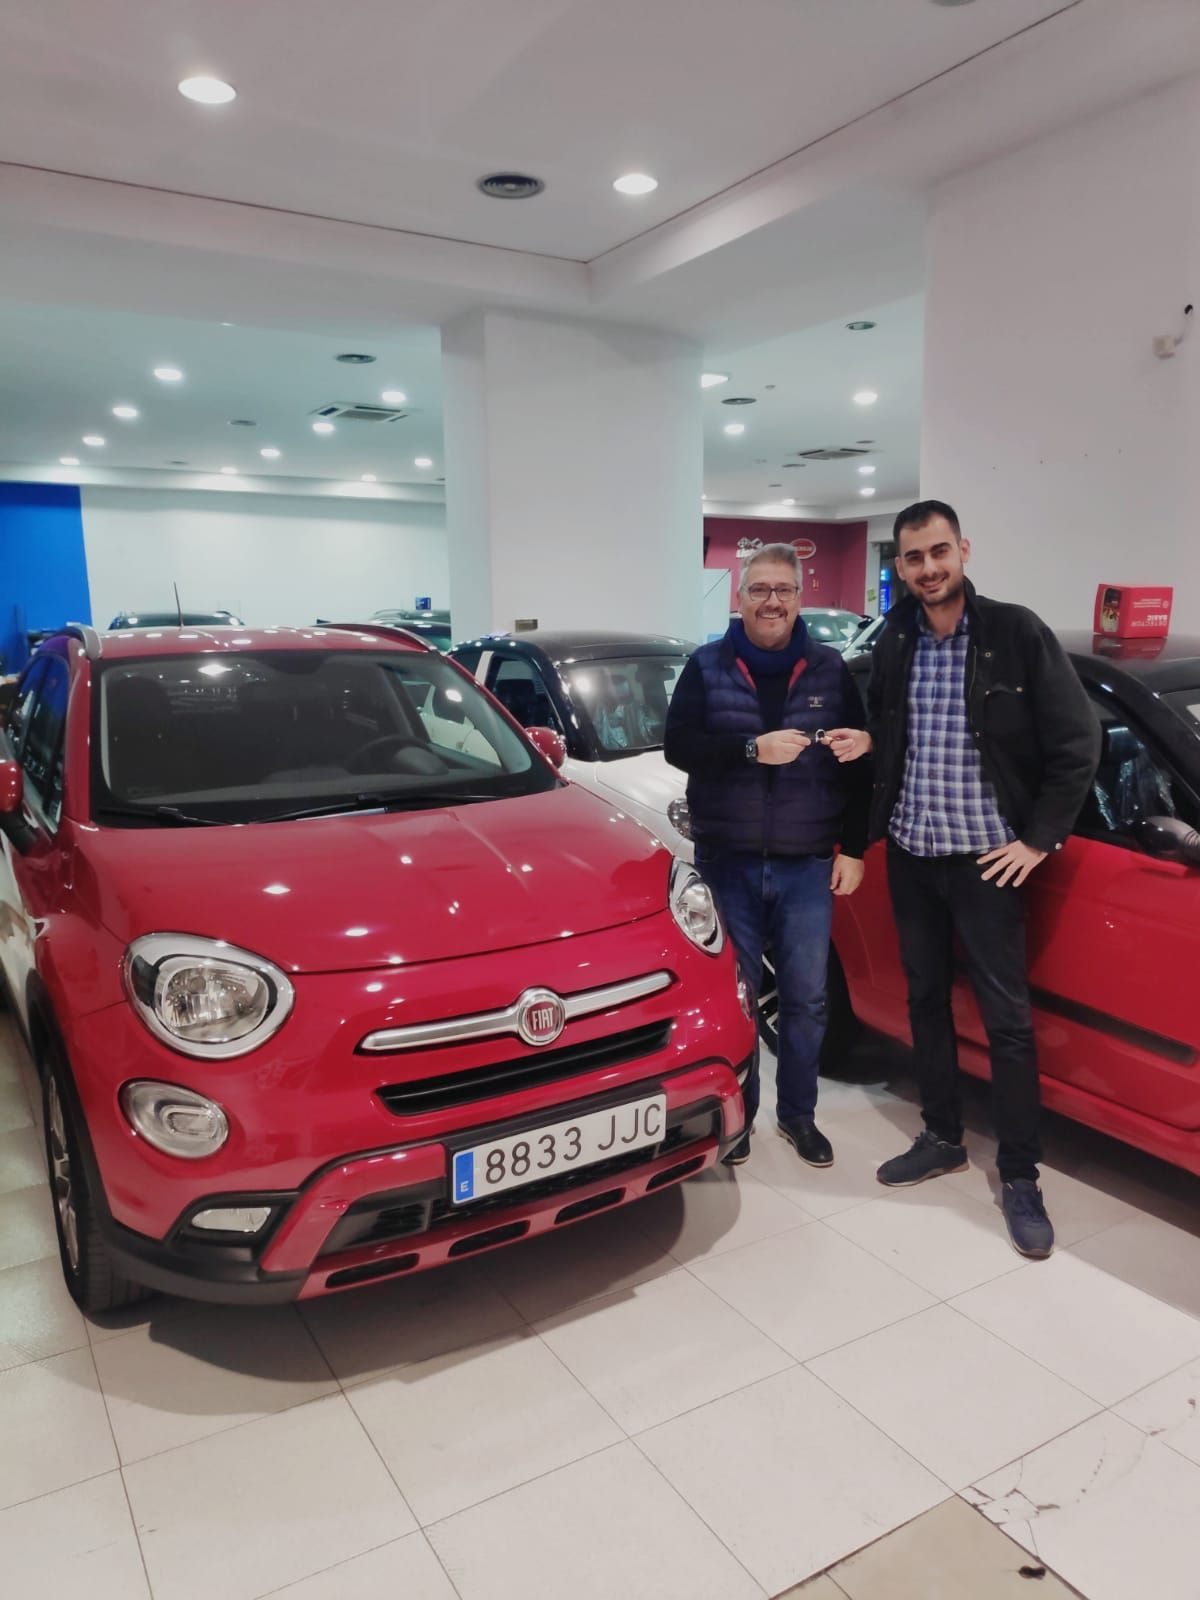 Milautomóviles entrega un Fiat 500X Cross, automático, 4x4 a Enrique vecino de Moncada